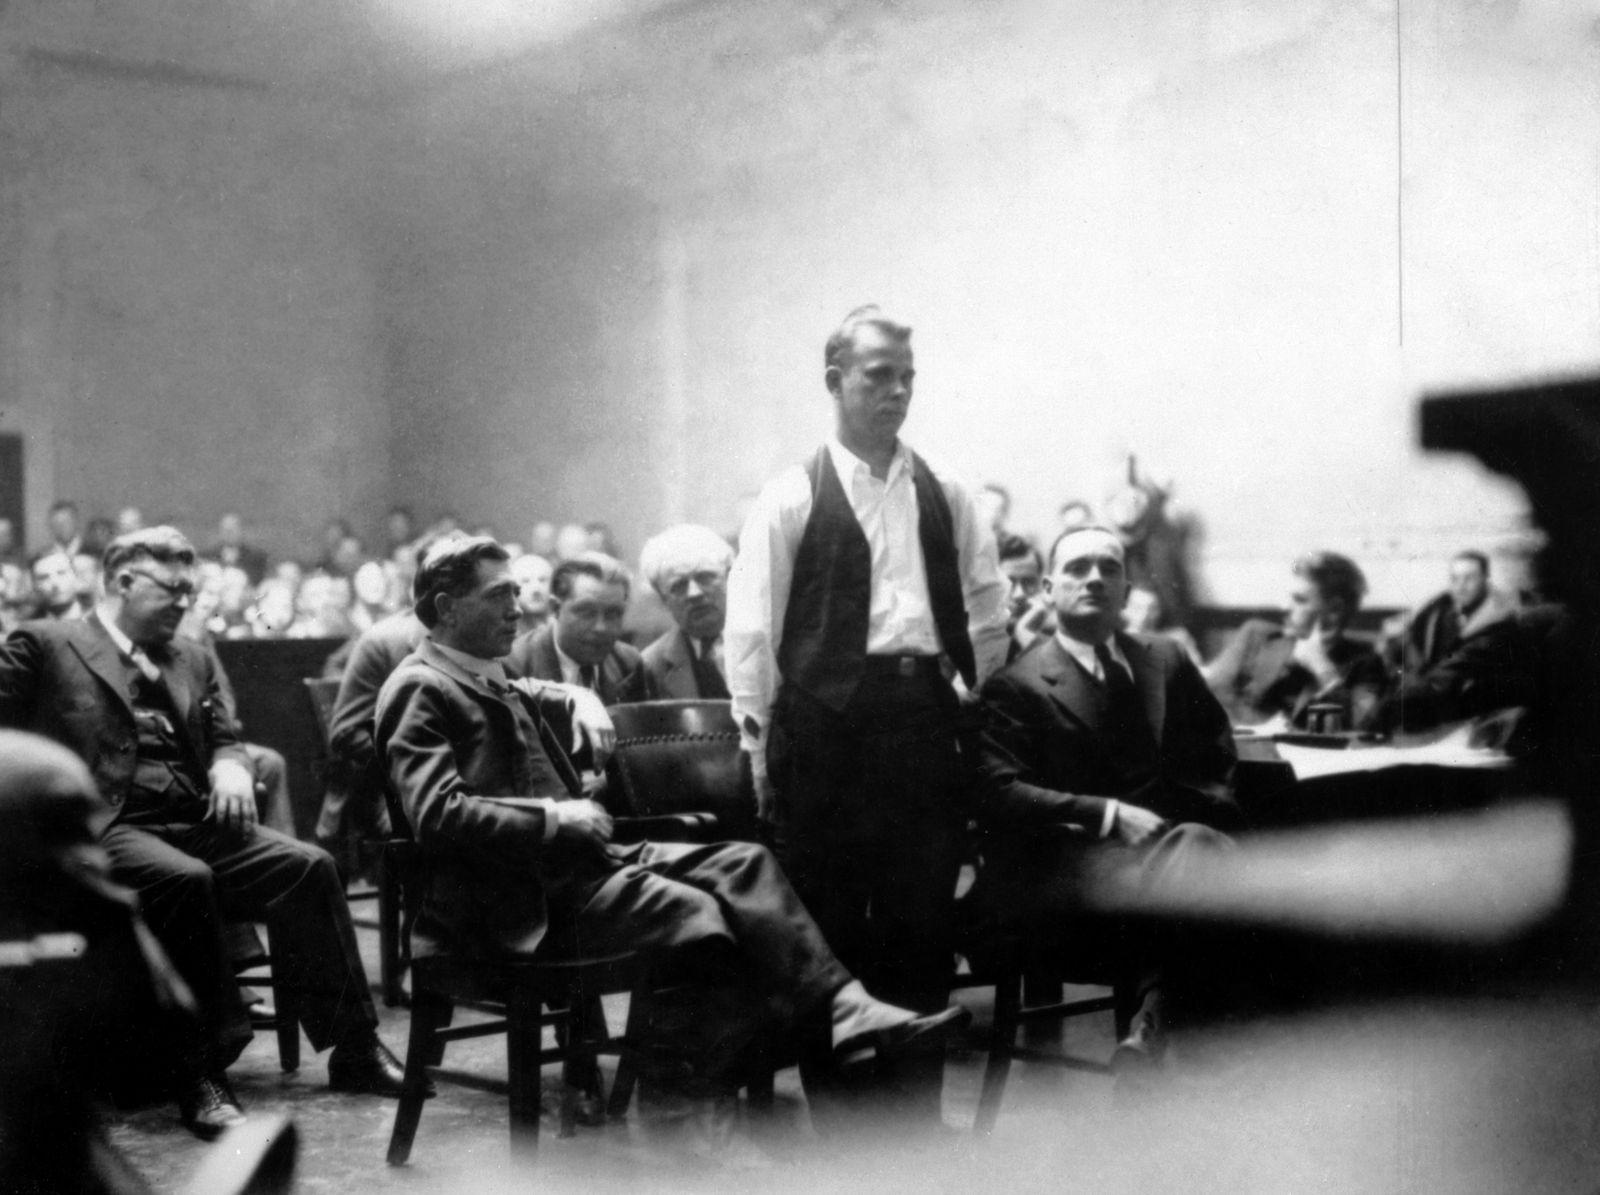 Forensik - Dillinger In Court